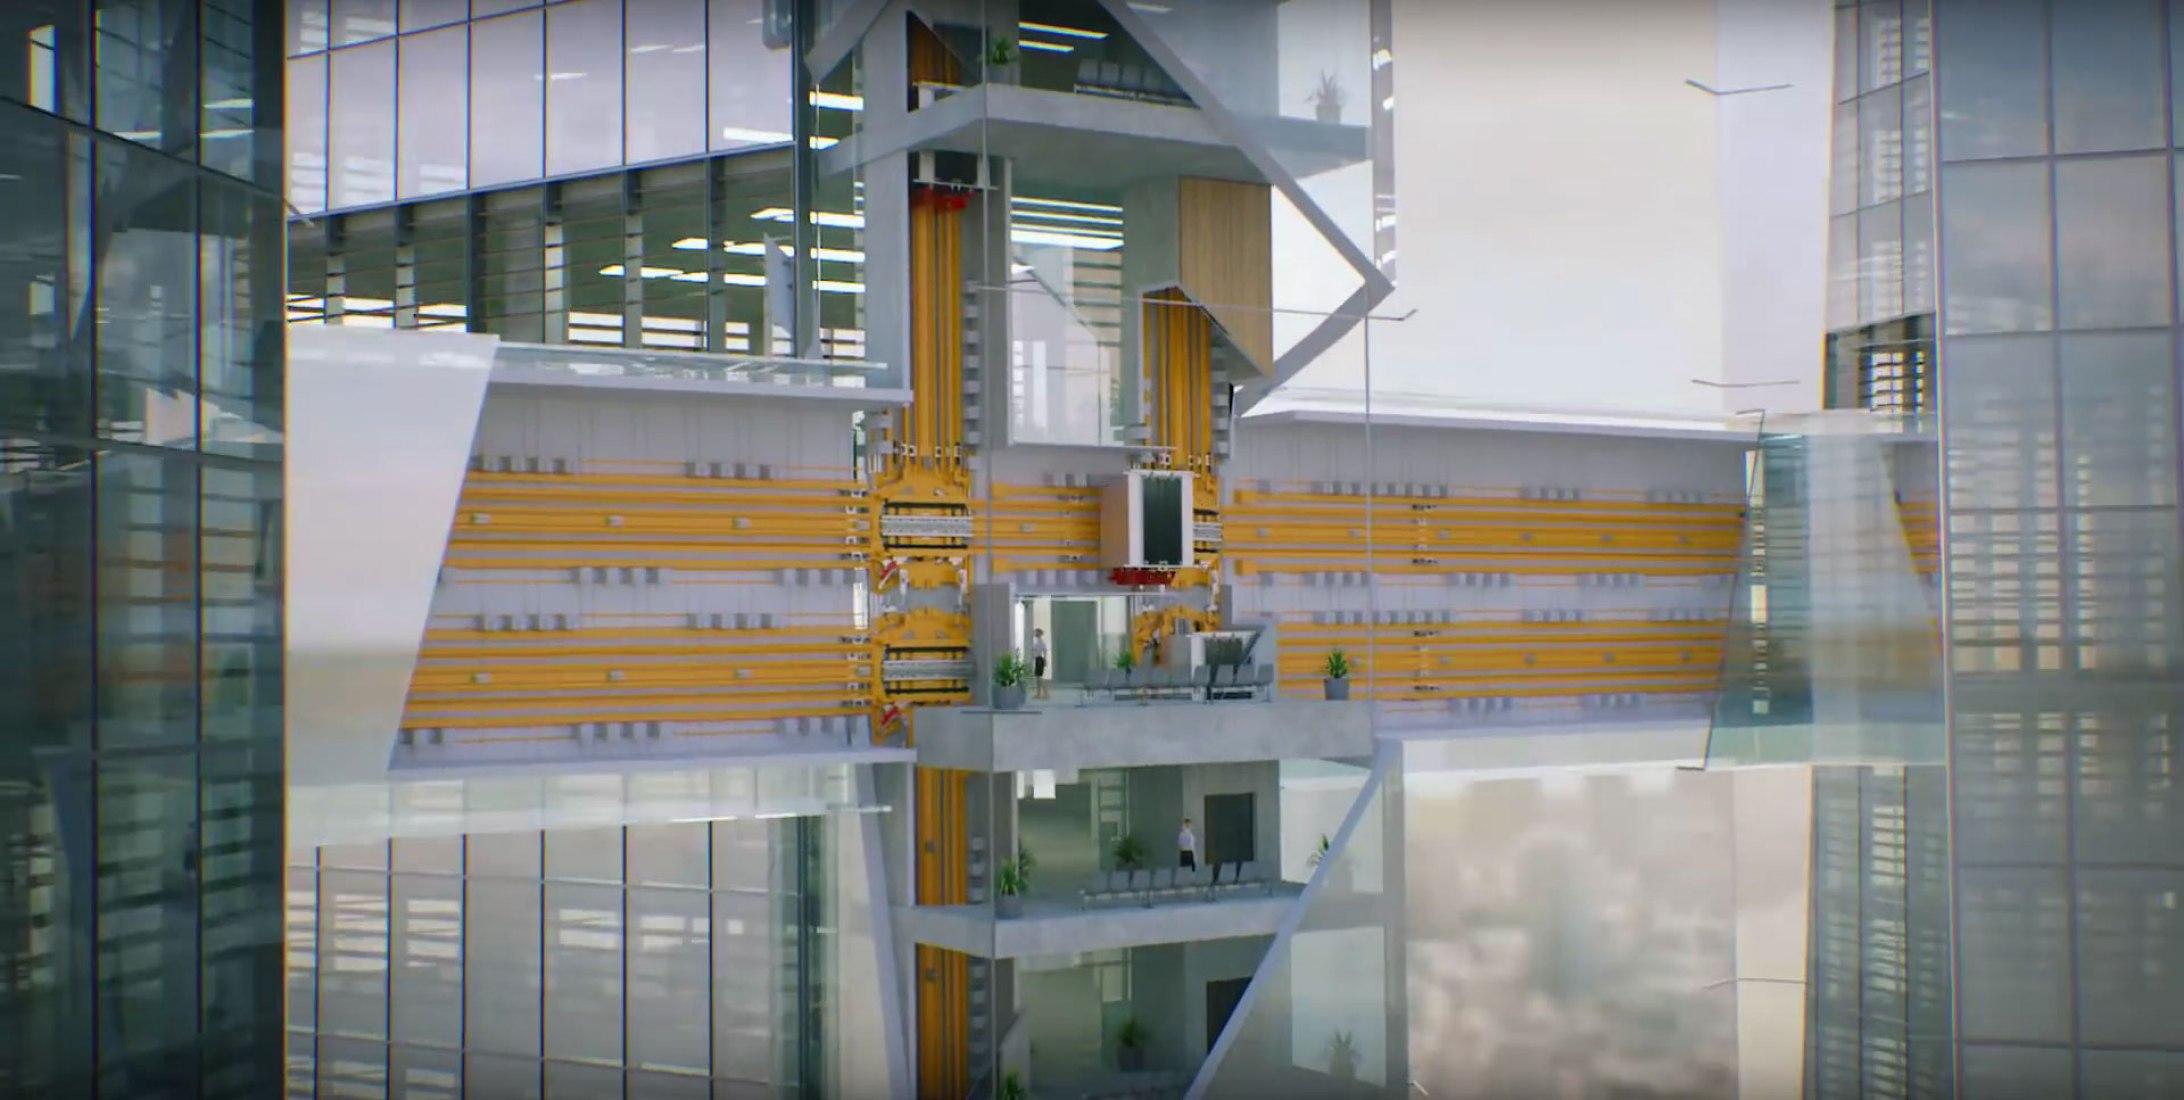 MULTI. The  Thyssenkrupp's Sideways-Moving Elevator